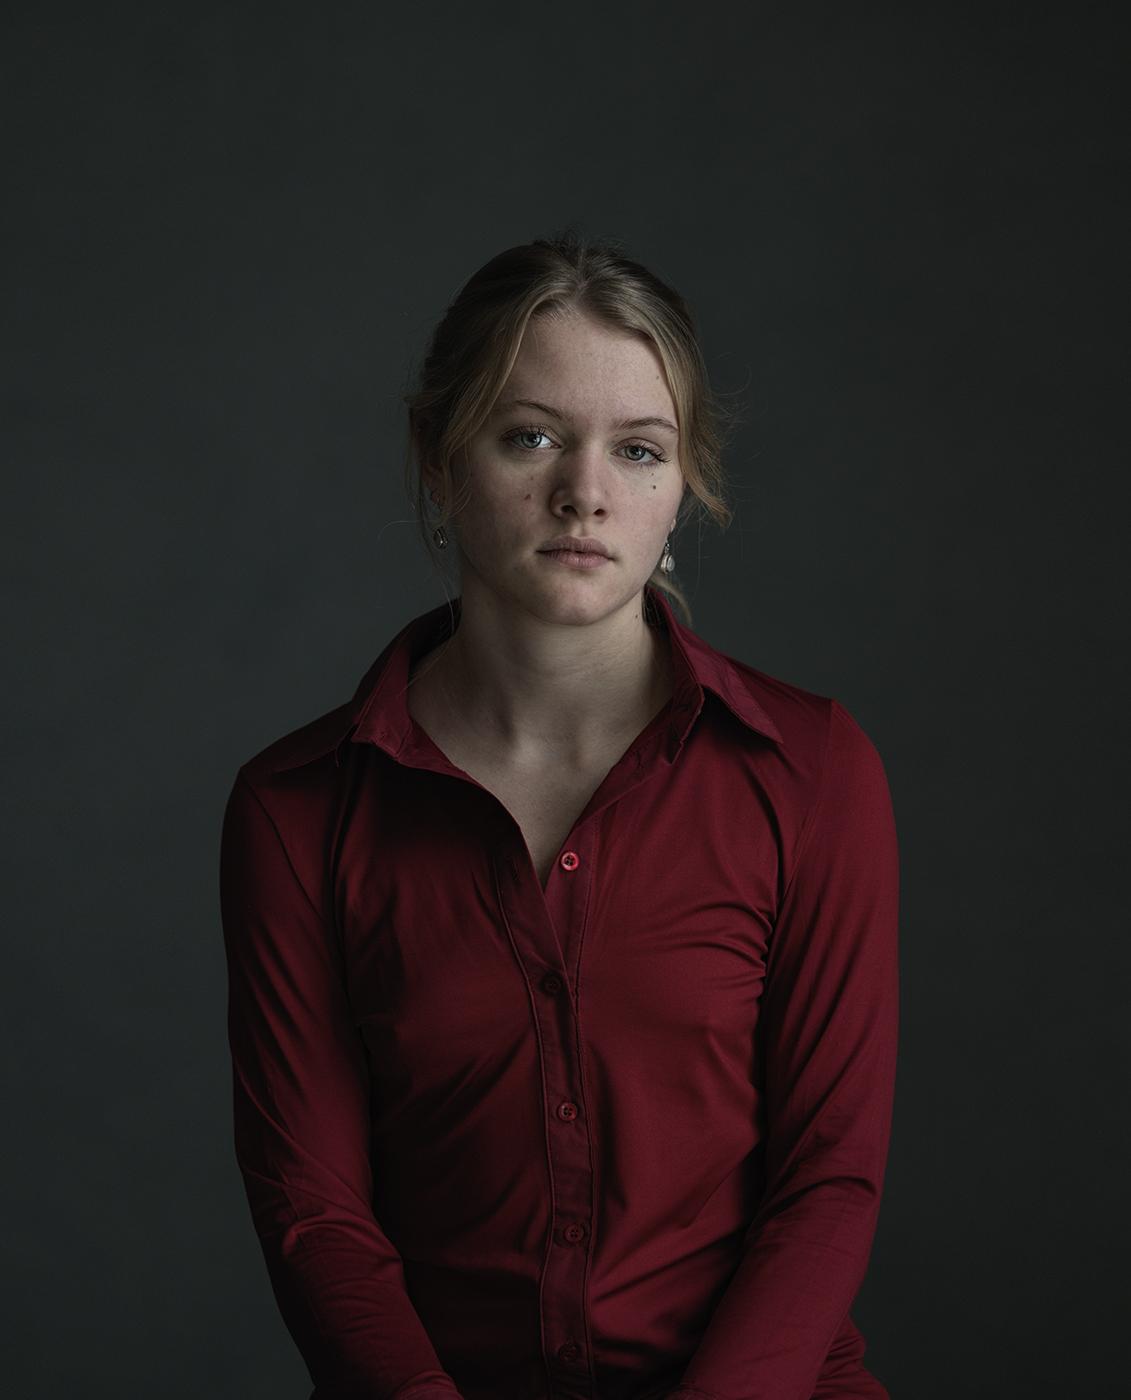 portrait of Brechje, Susanne Middelberg, Portrait, portret, portretfotografie,